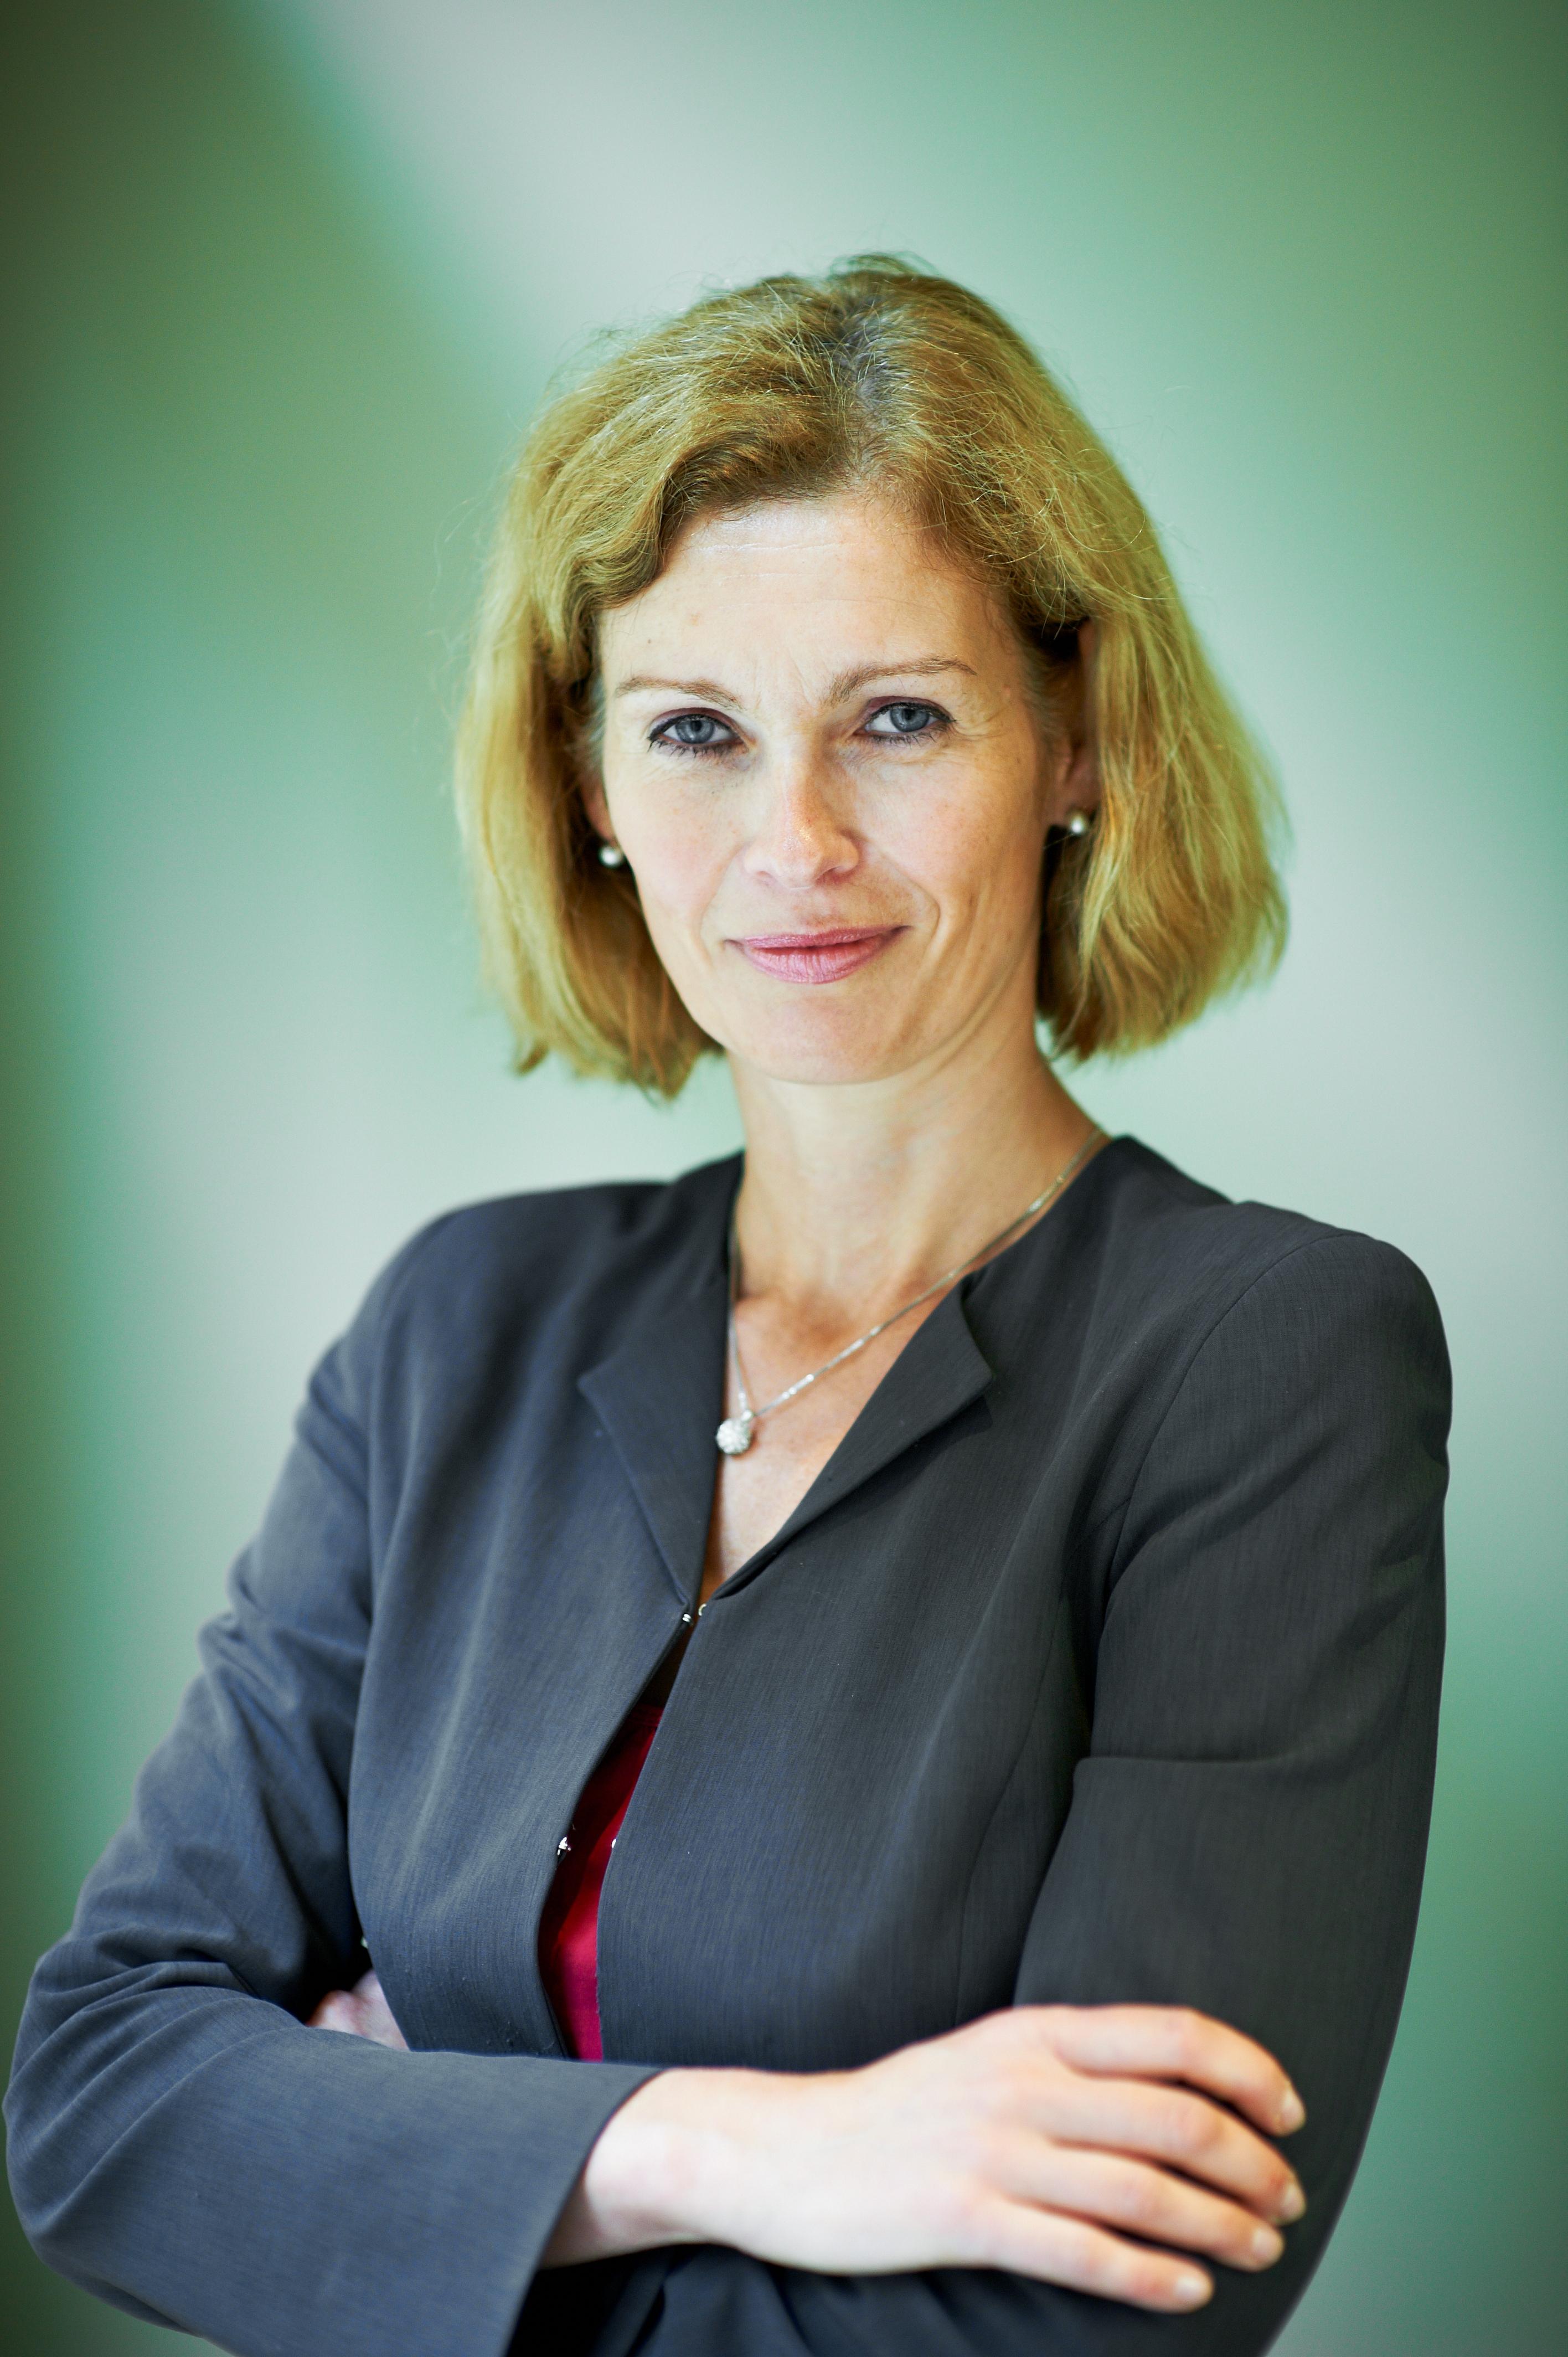 Dr. Susanne Nies